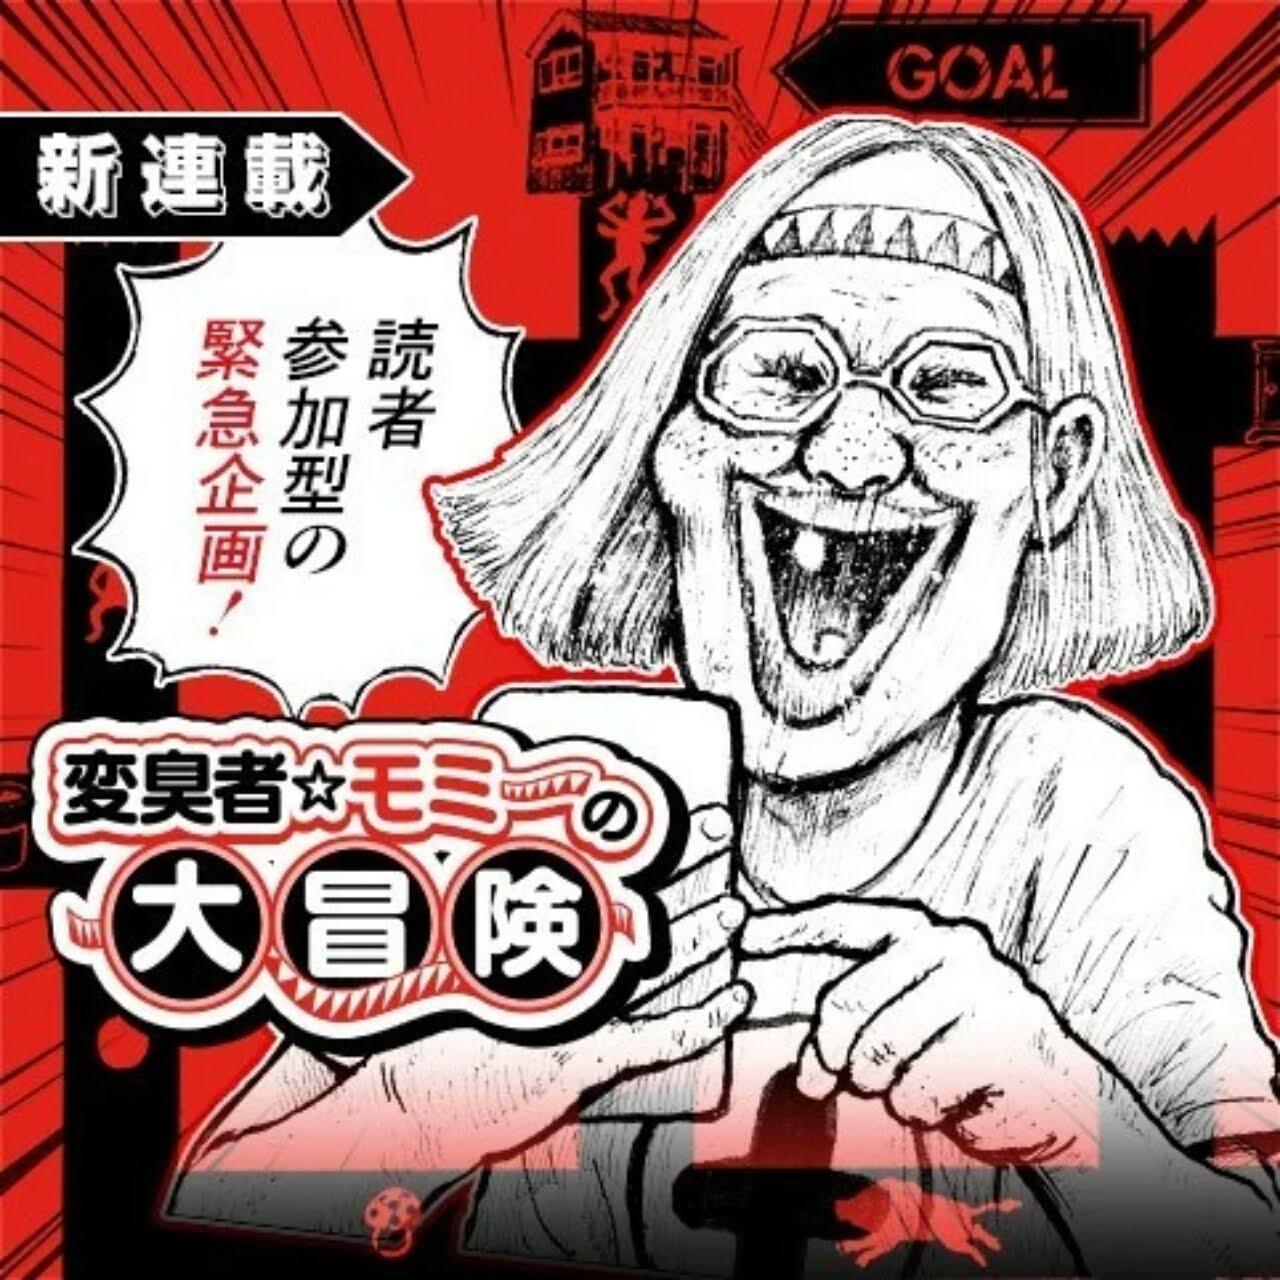 Man-gatarō Meluncurkan Manga Dengan Masukan Pembaca Langsung 1